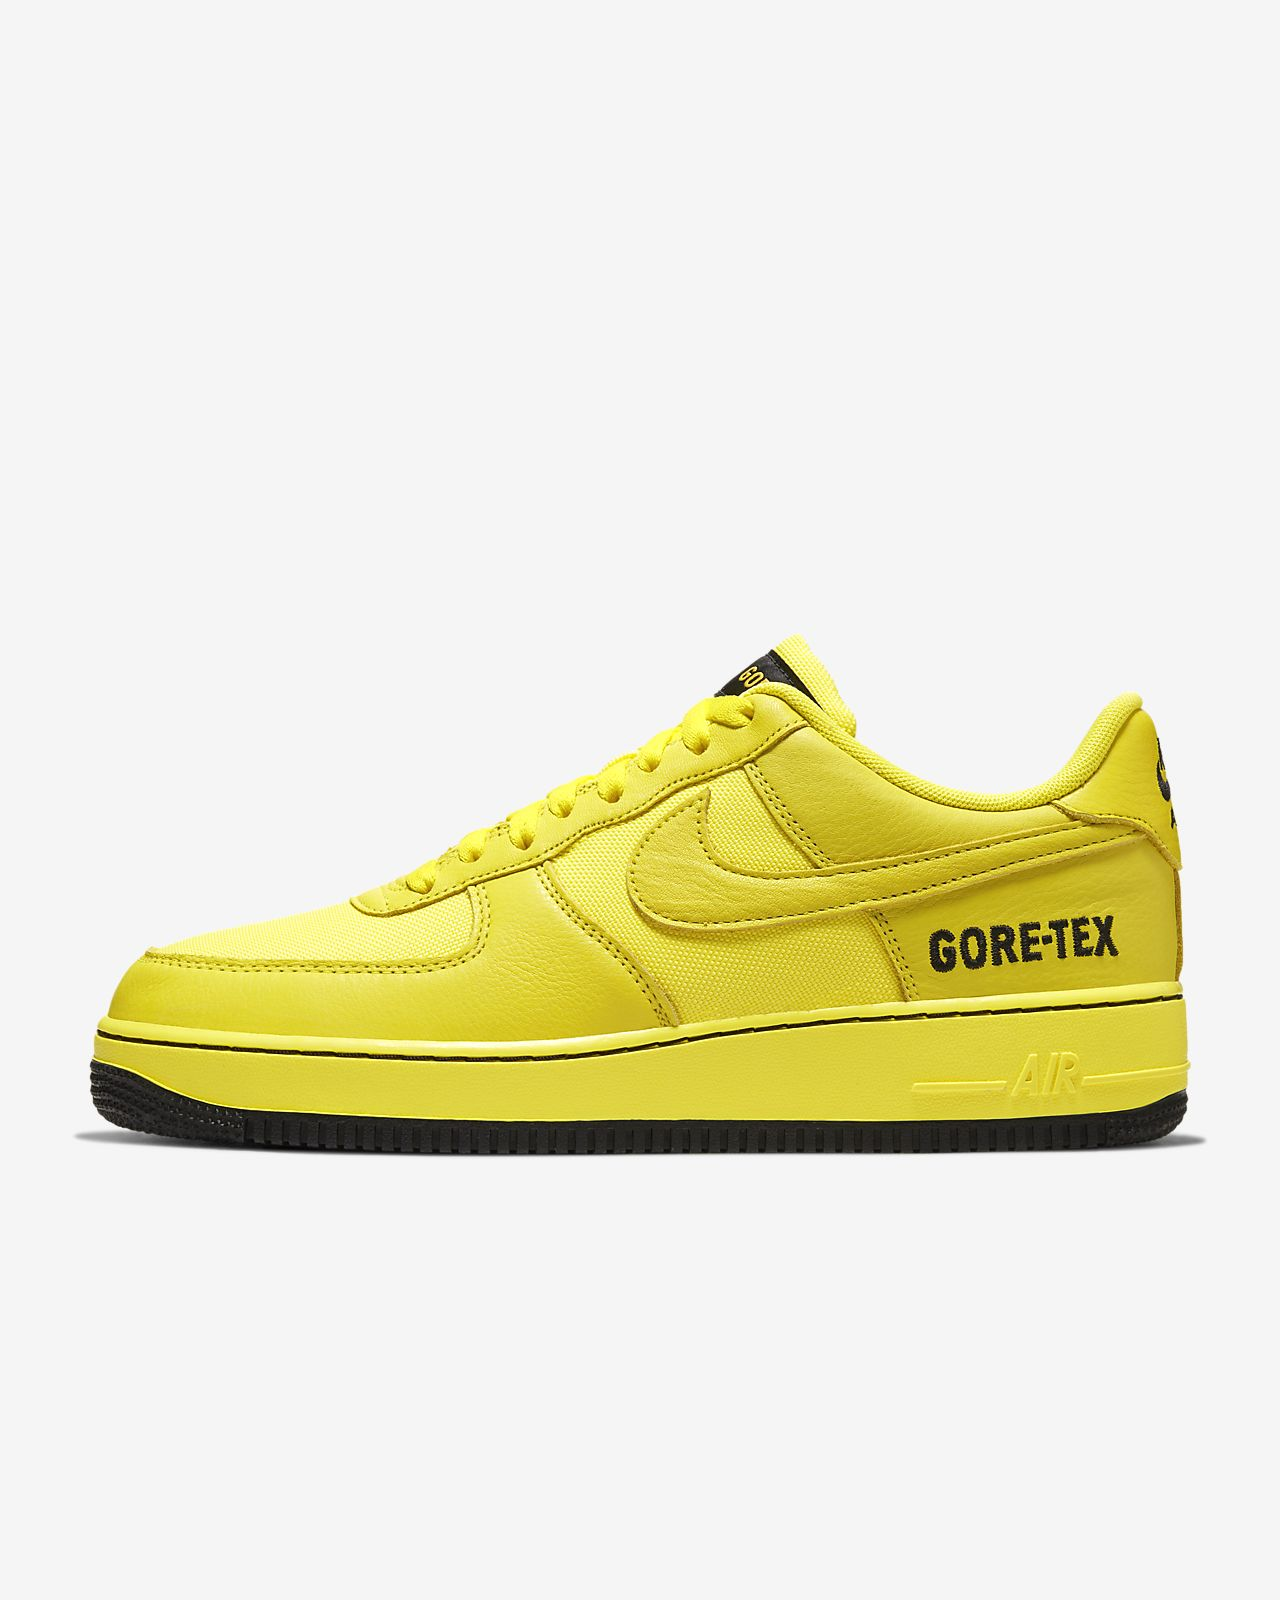 Nike Air Force 1 GORE-TEX Schoen